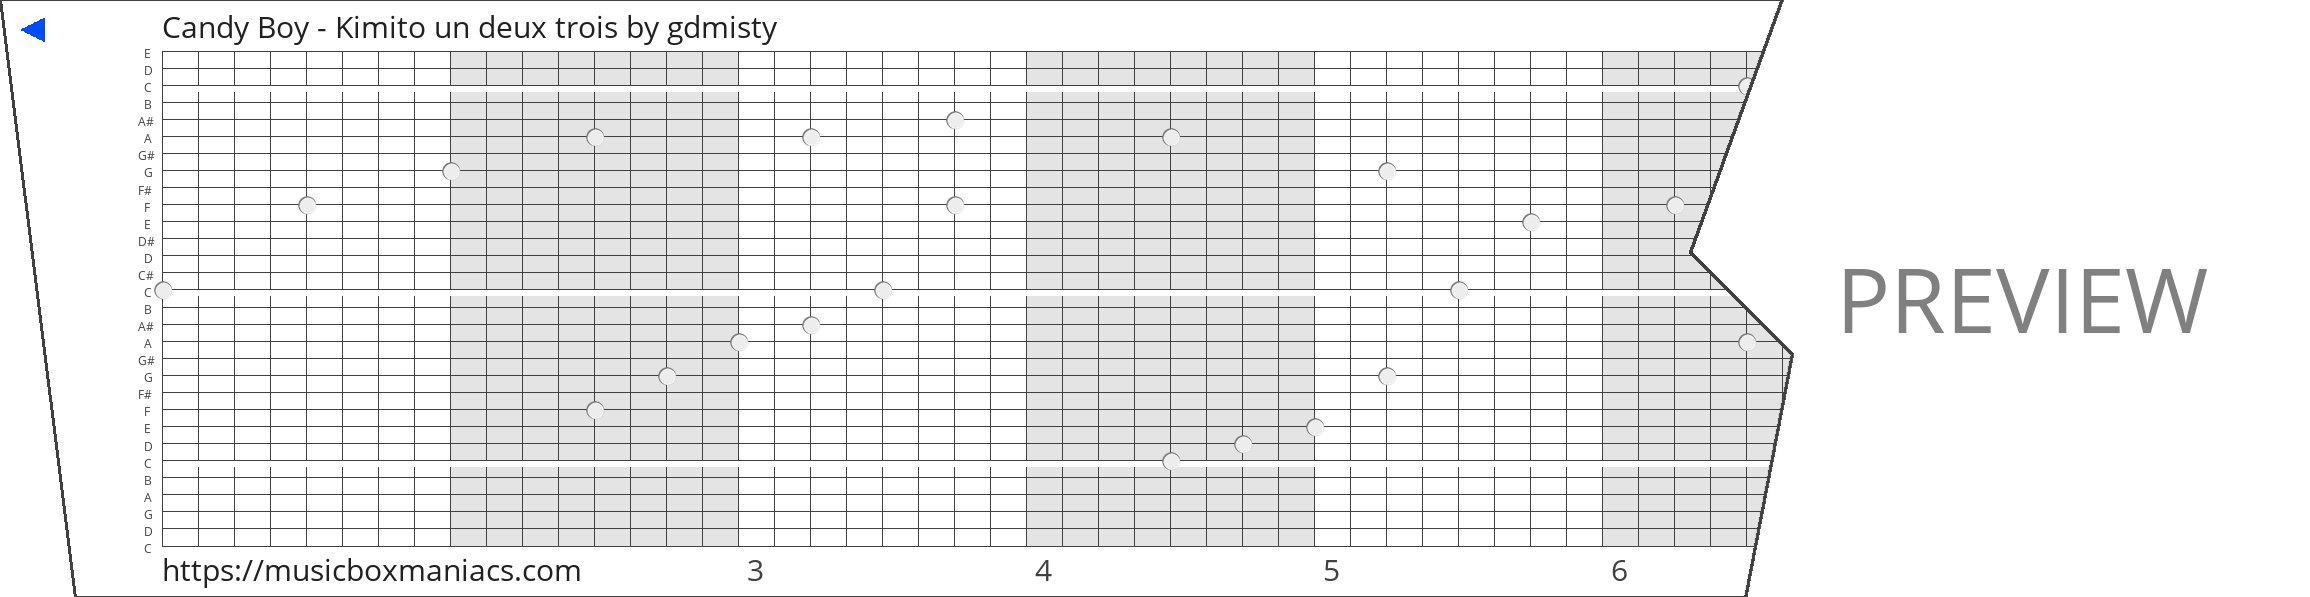 Candy Boy - Kimito un deux trois 30 note music box paper strip